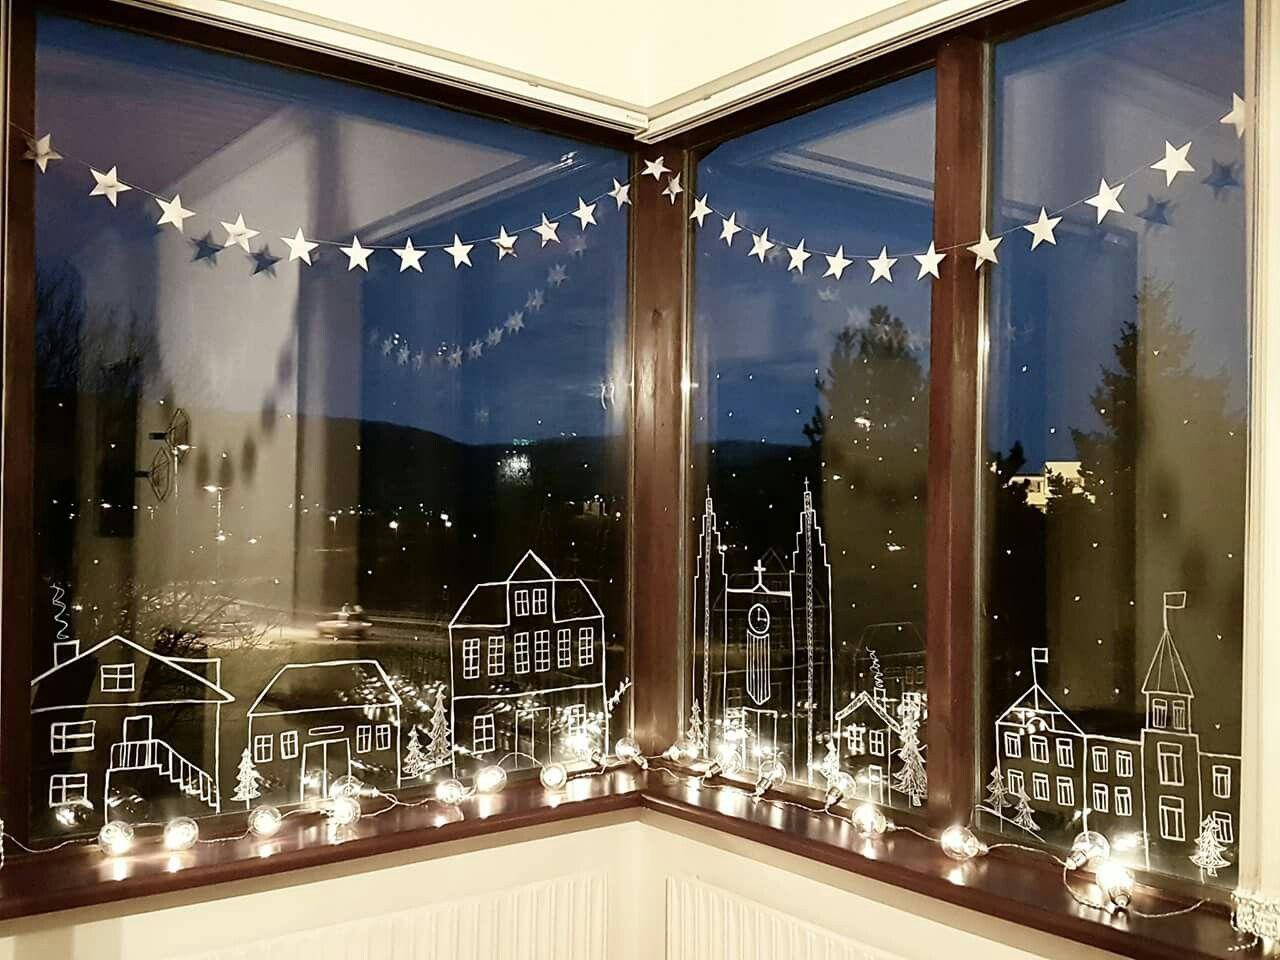 chalk pen on window for nice winter or holliday decoration jul rh pinterest com